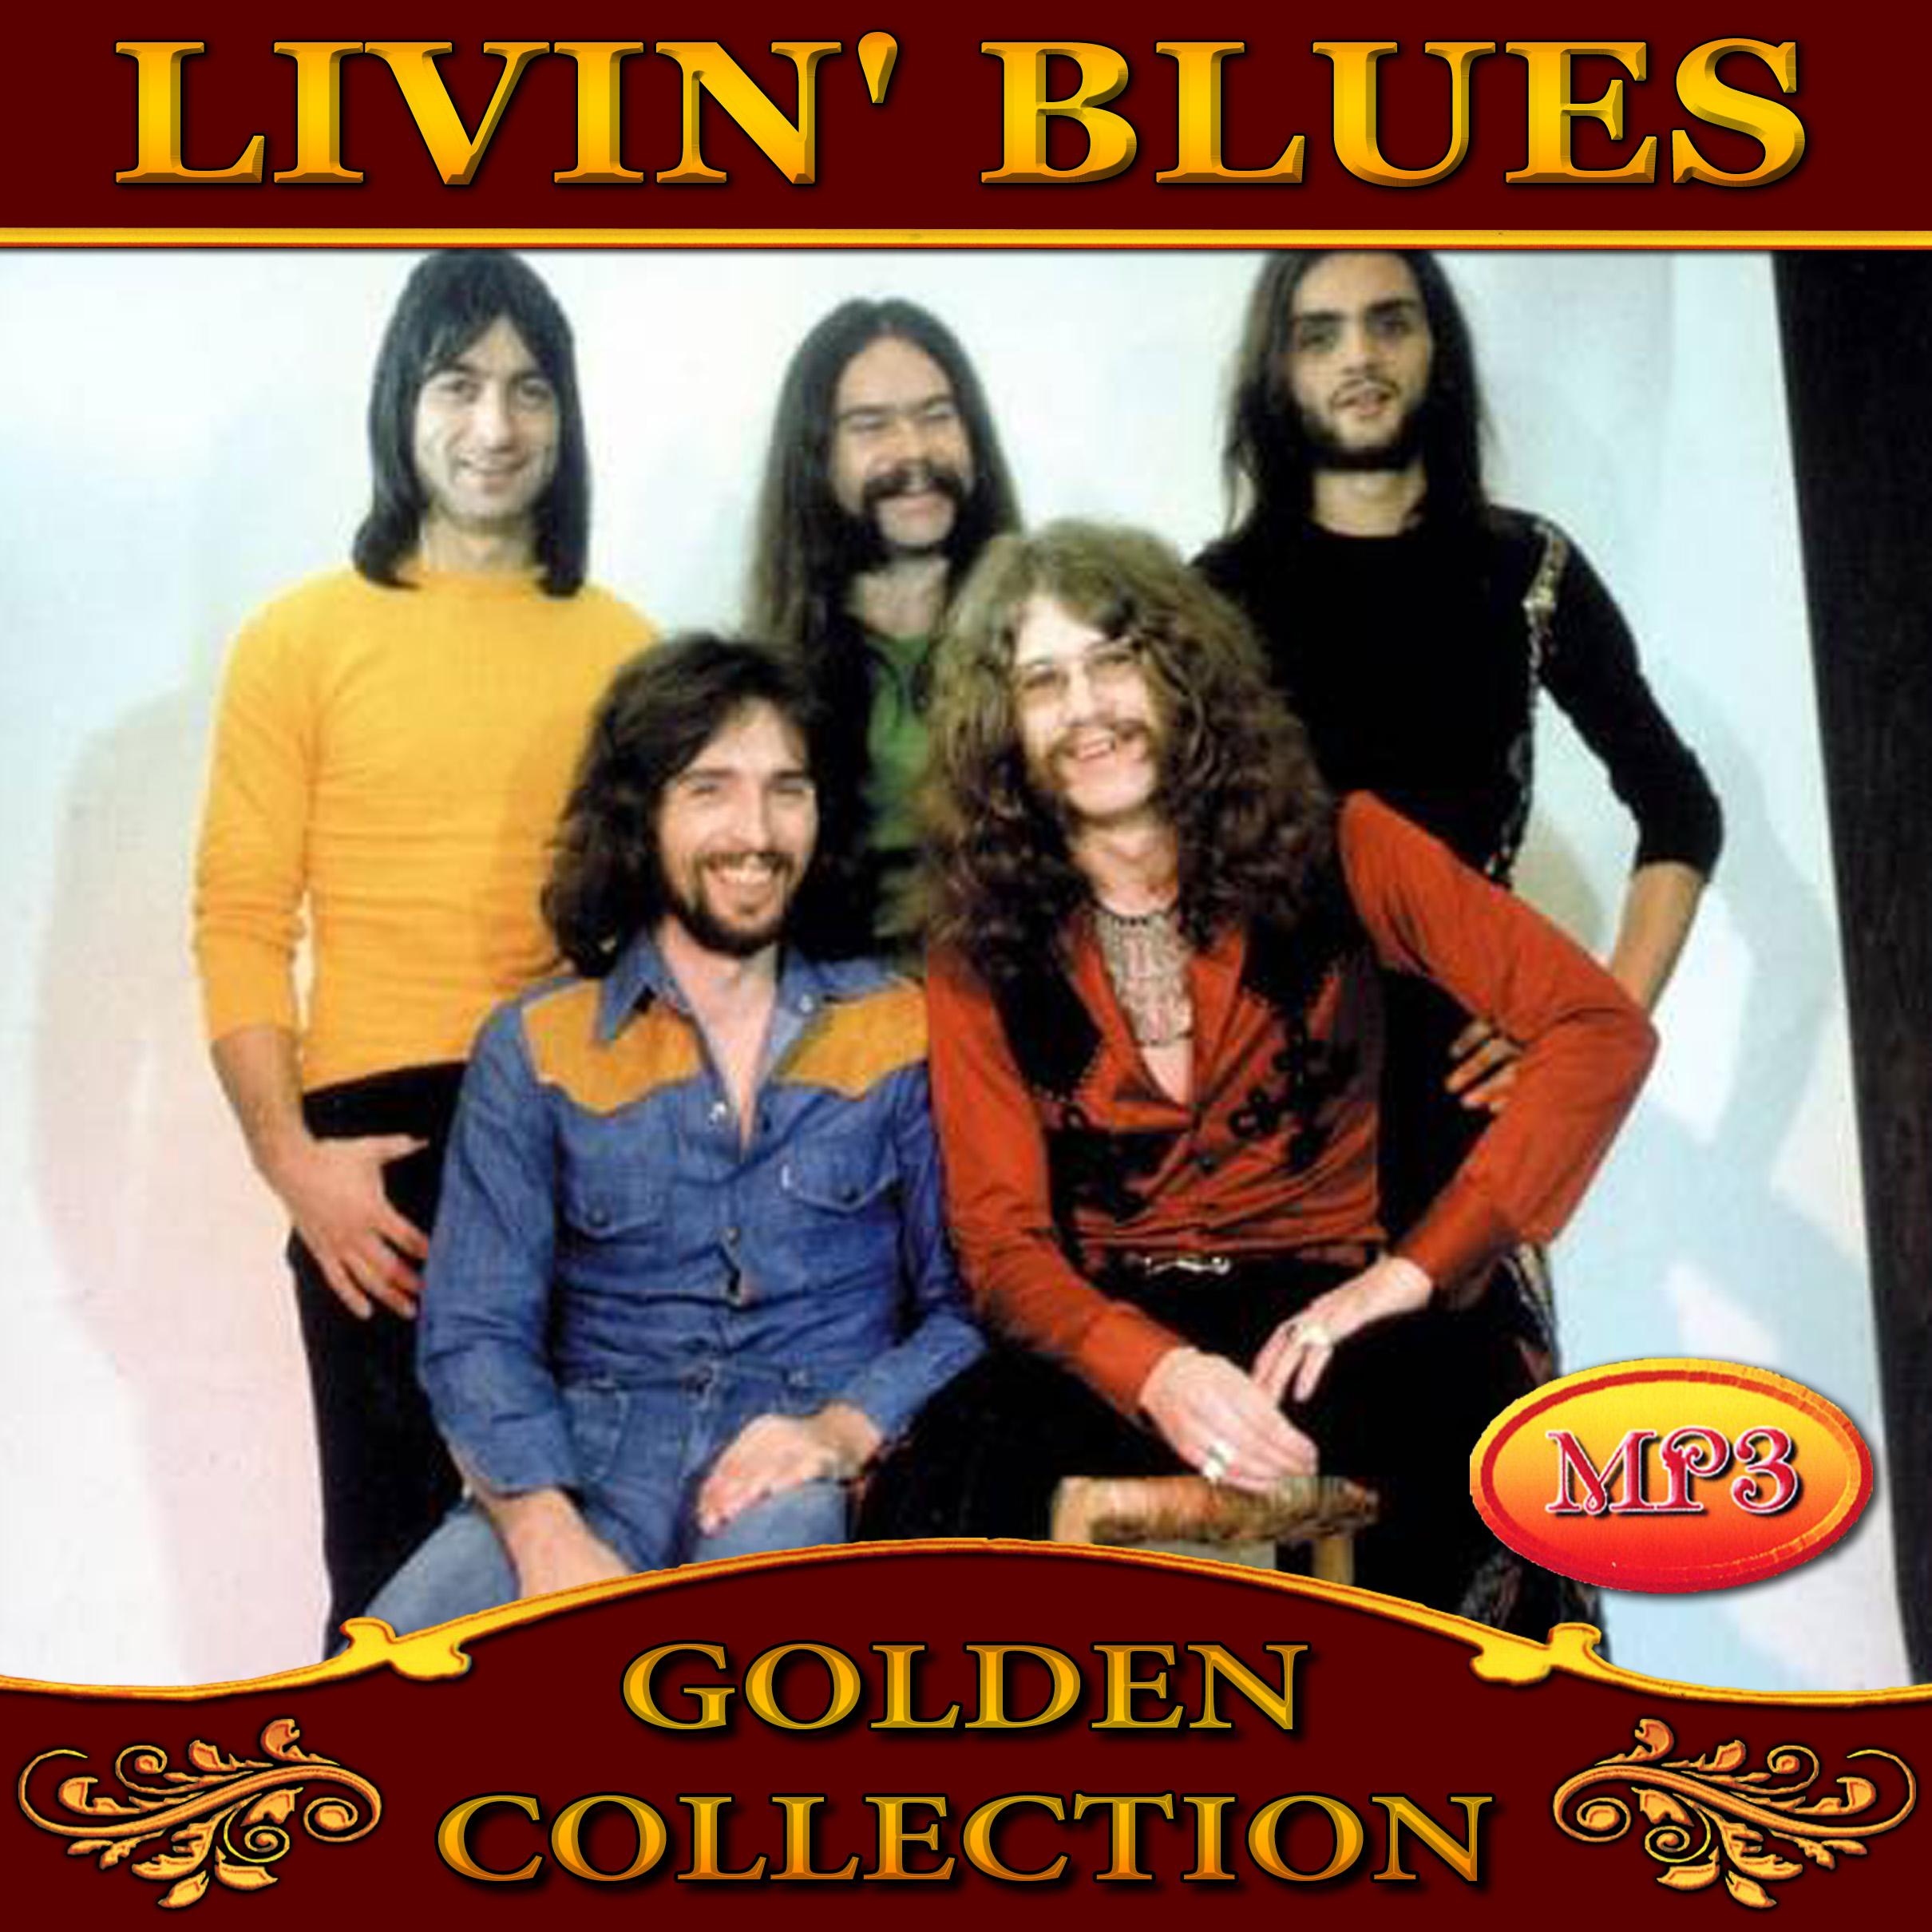 Livin' Blues [mp3]